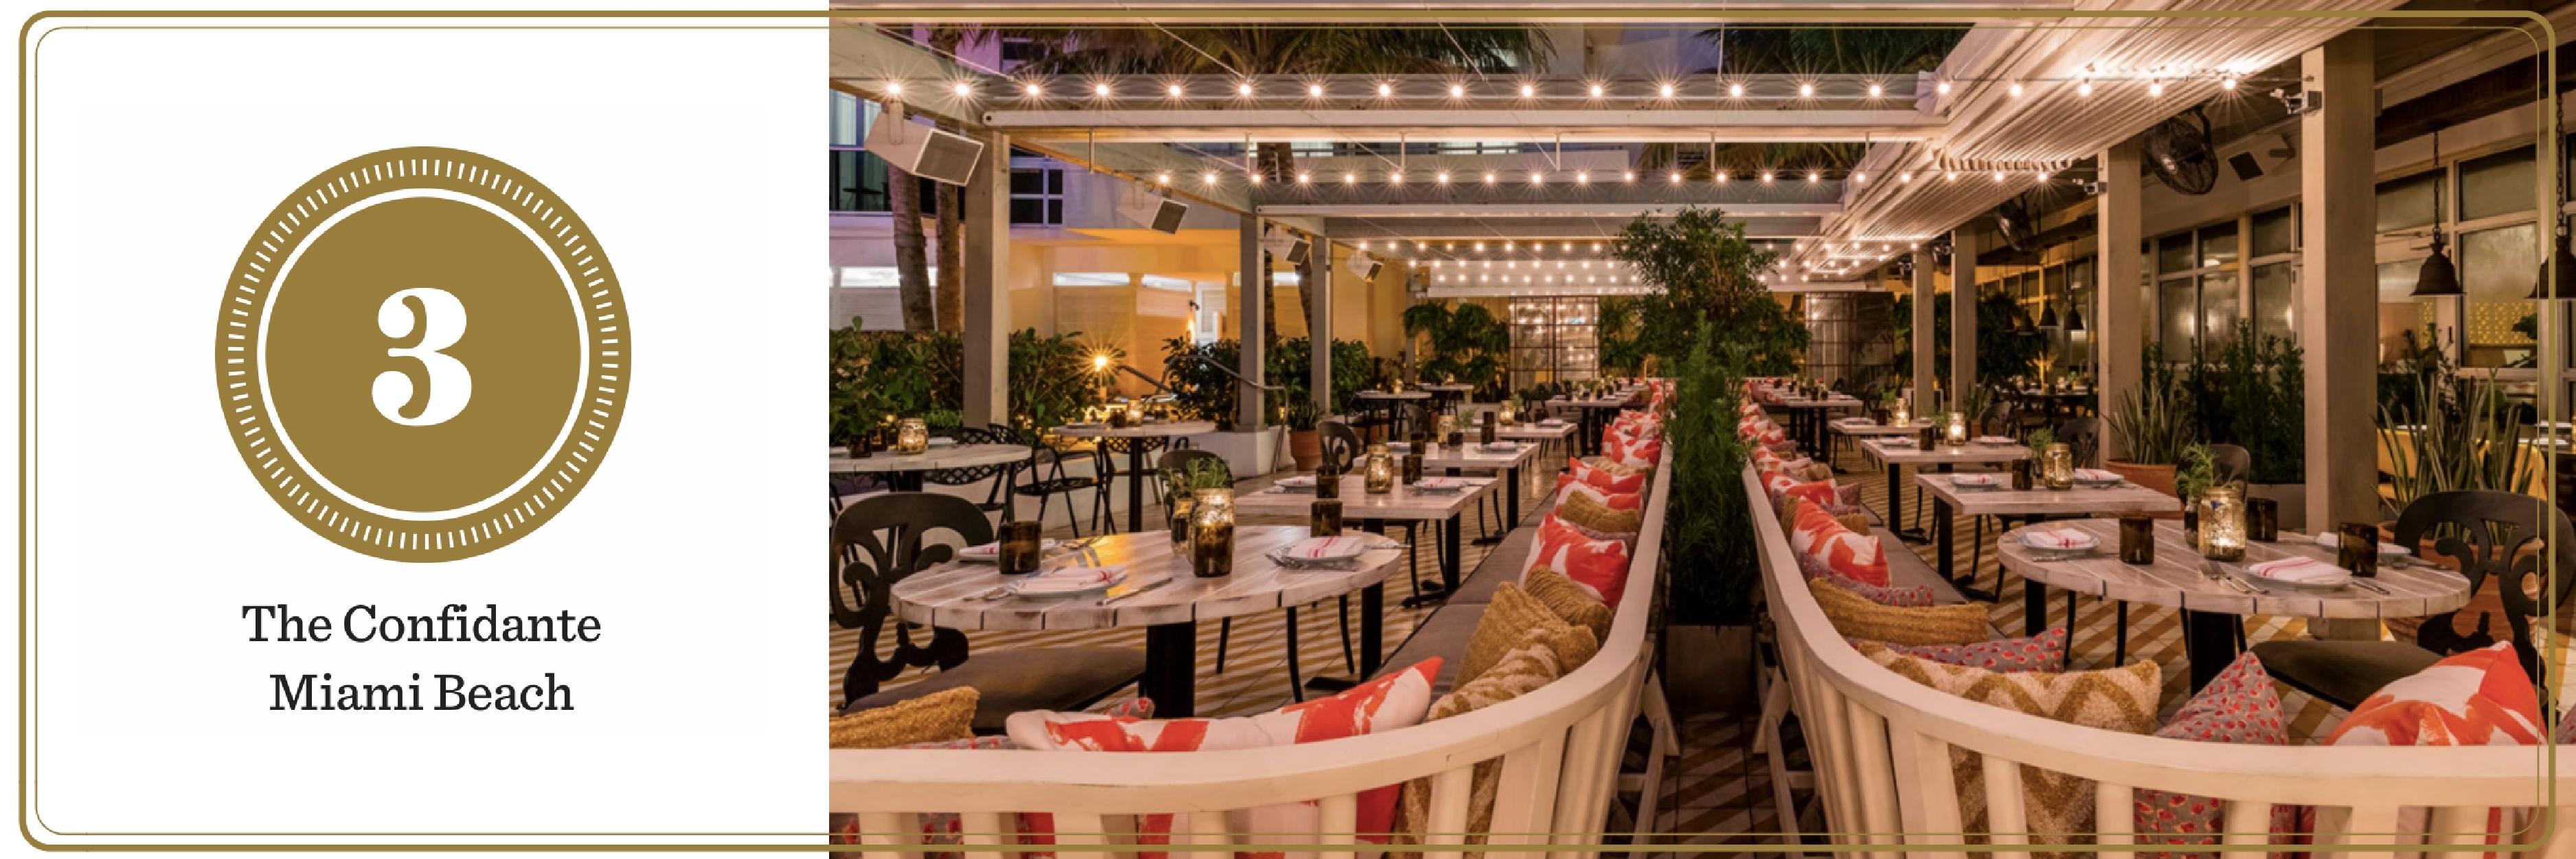 Hyatt - The Confidantes Miami Beach